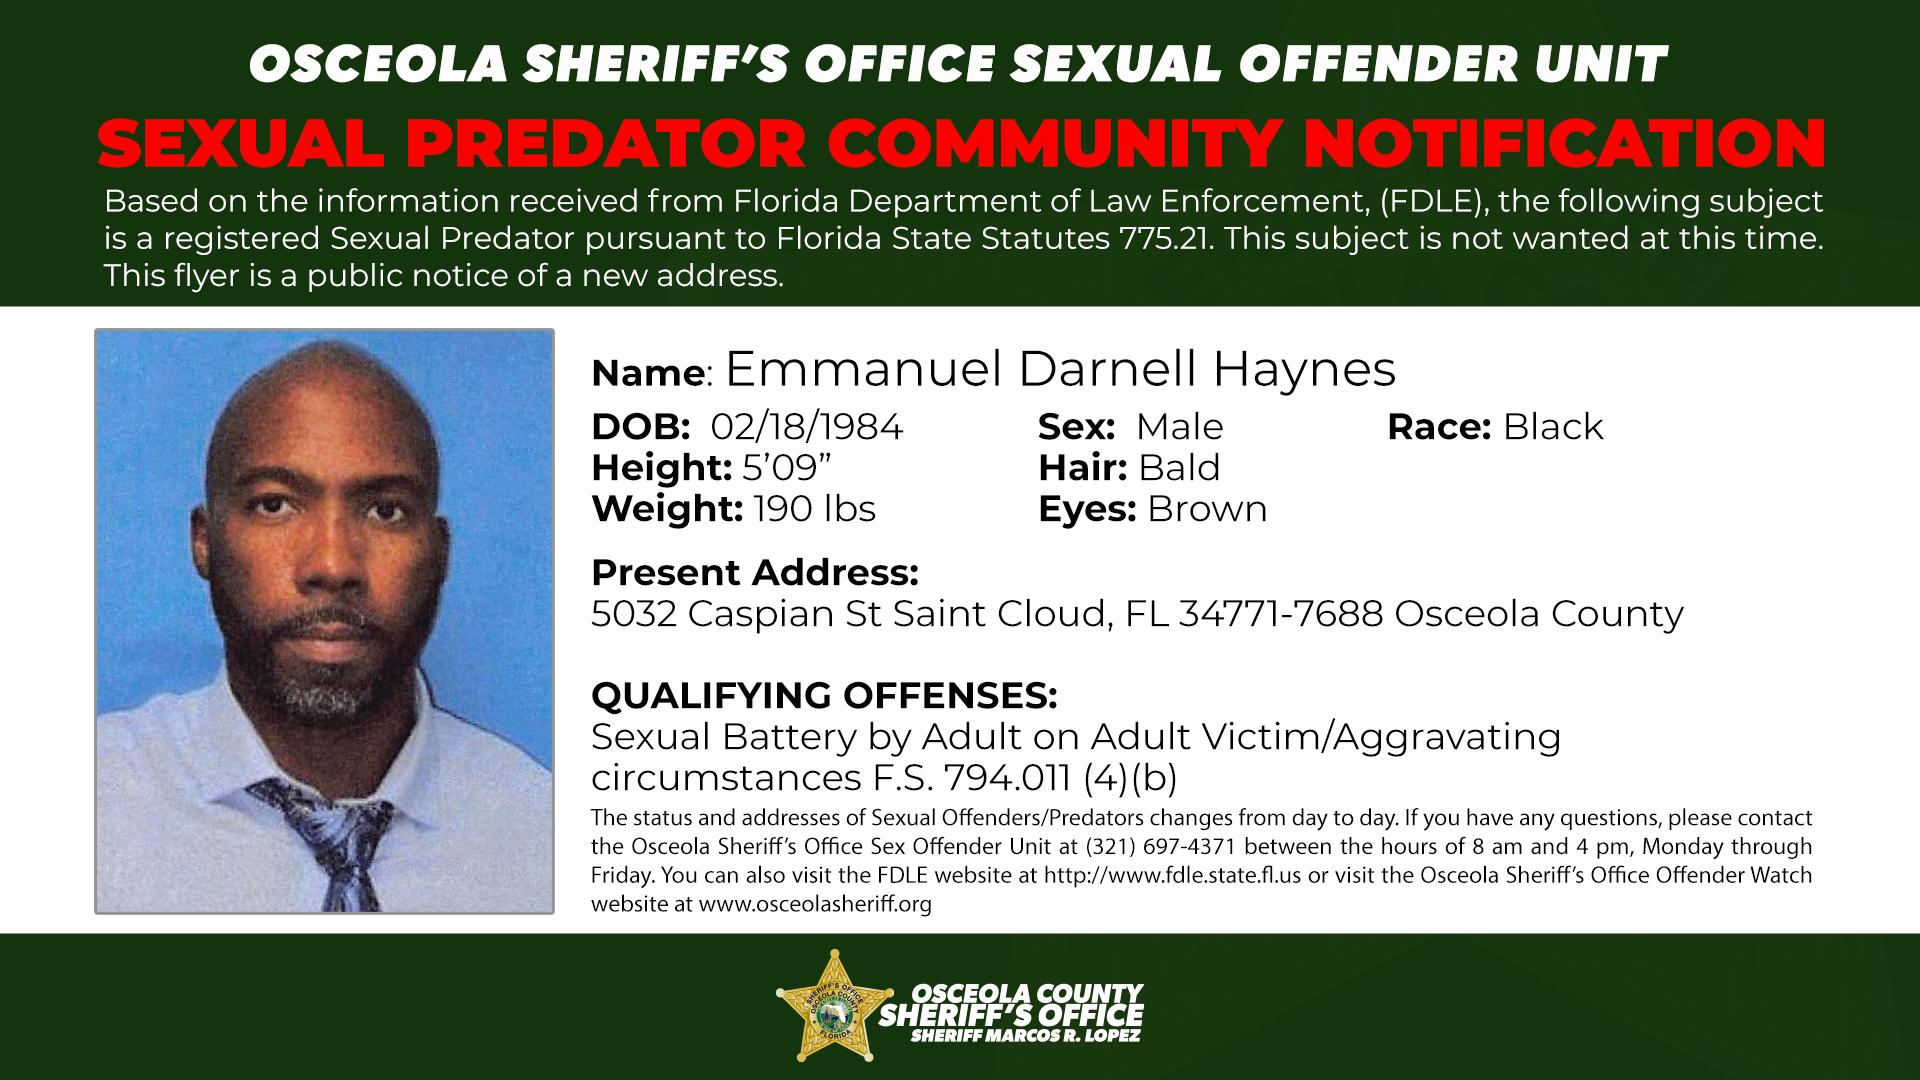 Emmanuel Darnell Haines - Sexual Predator